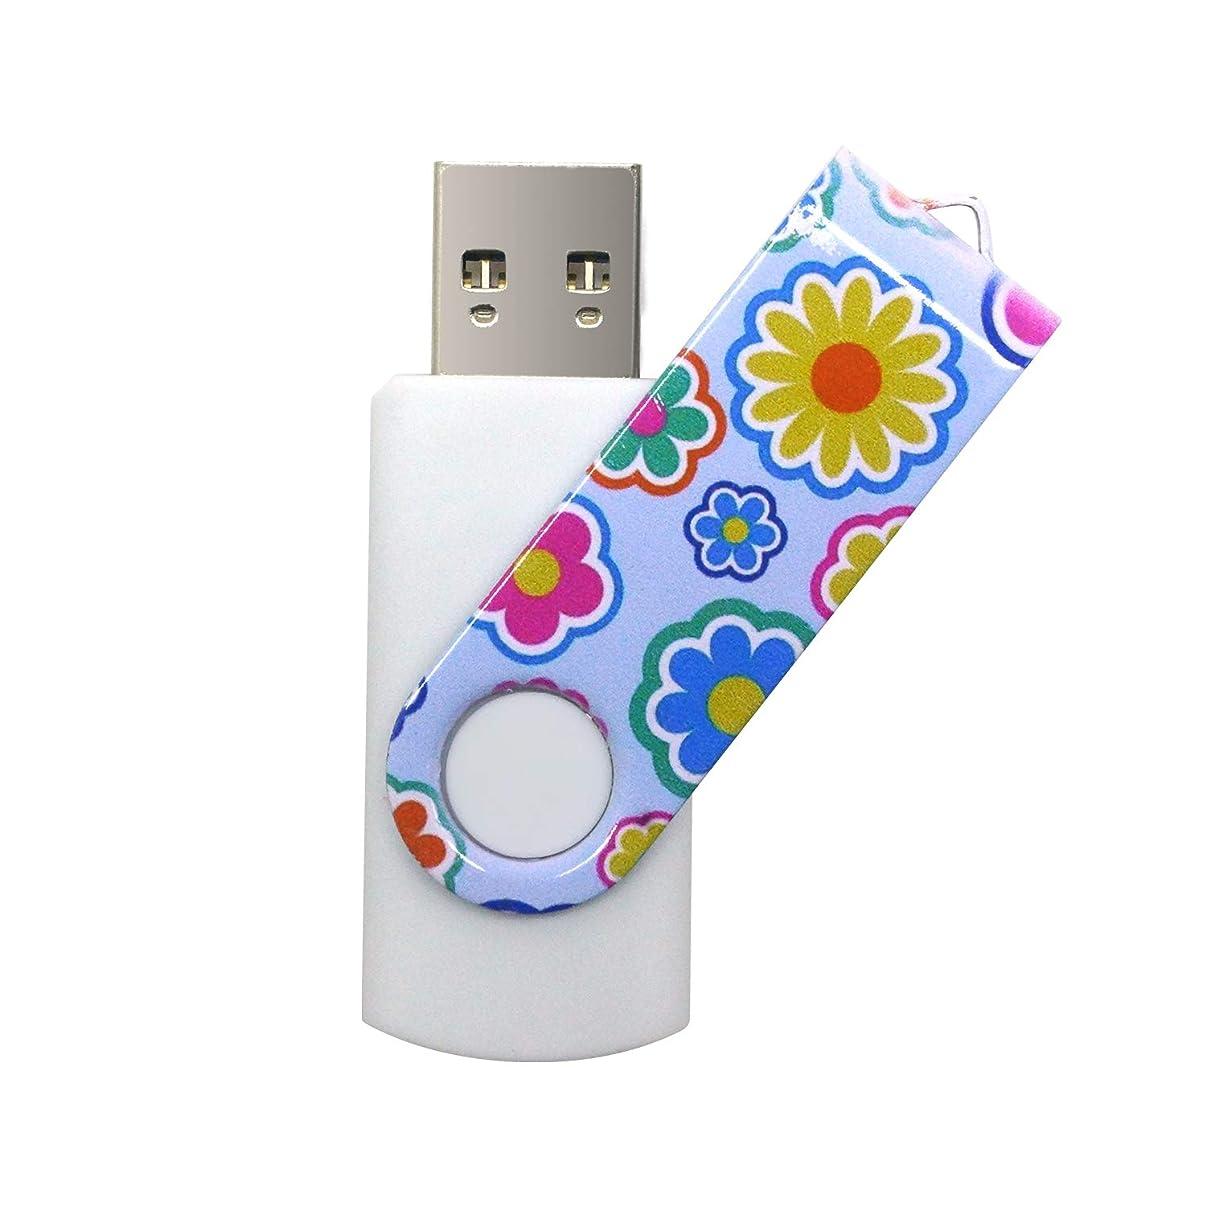 Vatapo USB 3.0 128GB Flash Drive Thumb Drive Memory Stick Jump Drive Transfer Speeds Up to 200MB/s (Colorful Flower) (128GB)